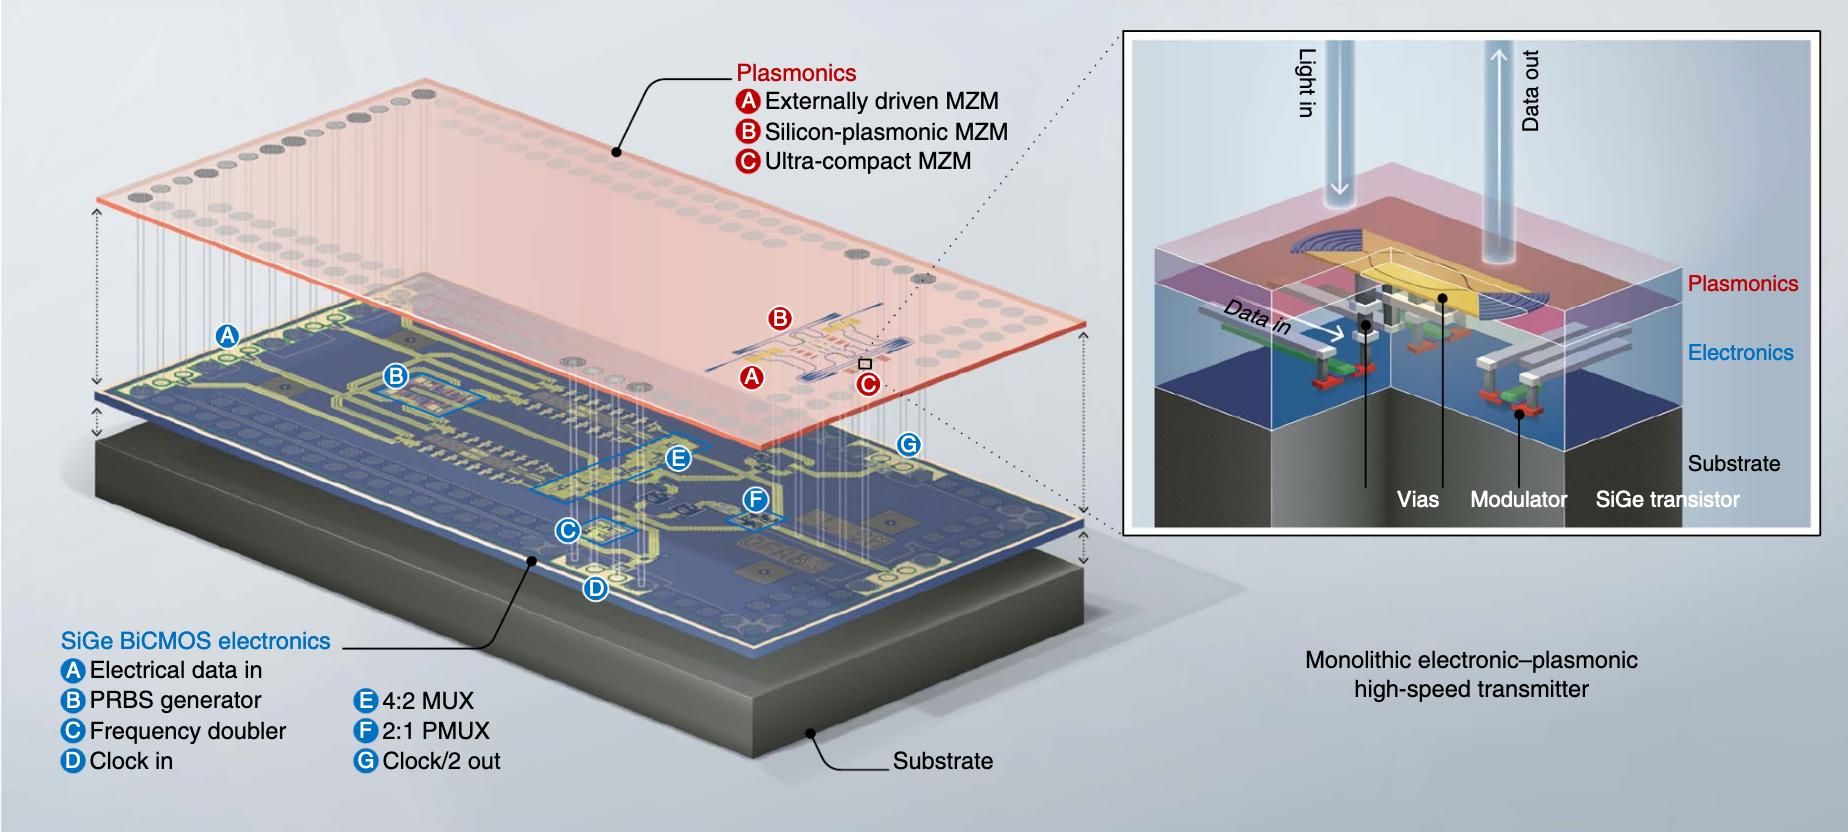 Monolithic electronic–plasmonic high-speed transmitter